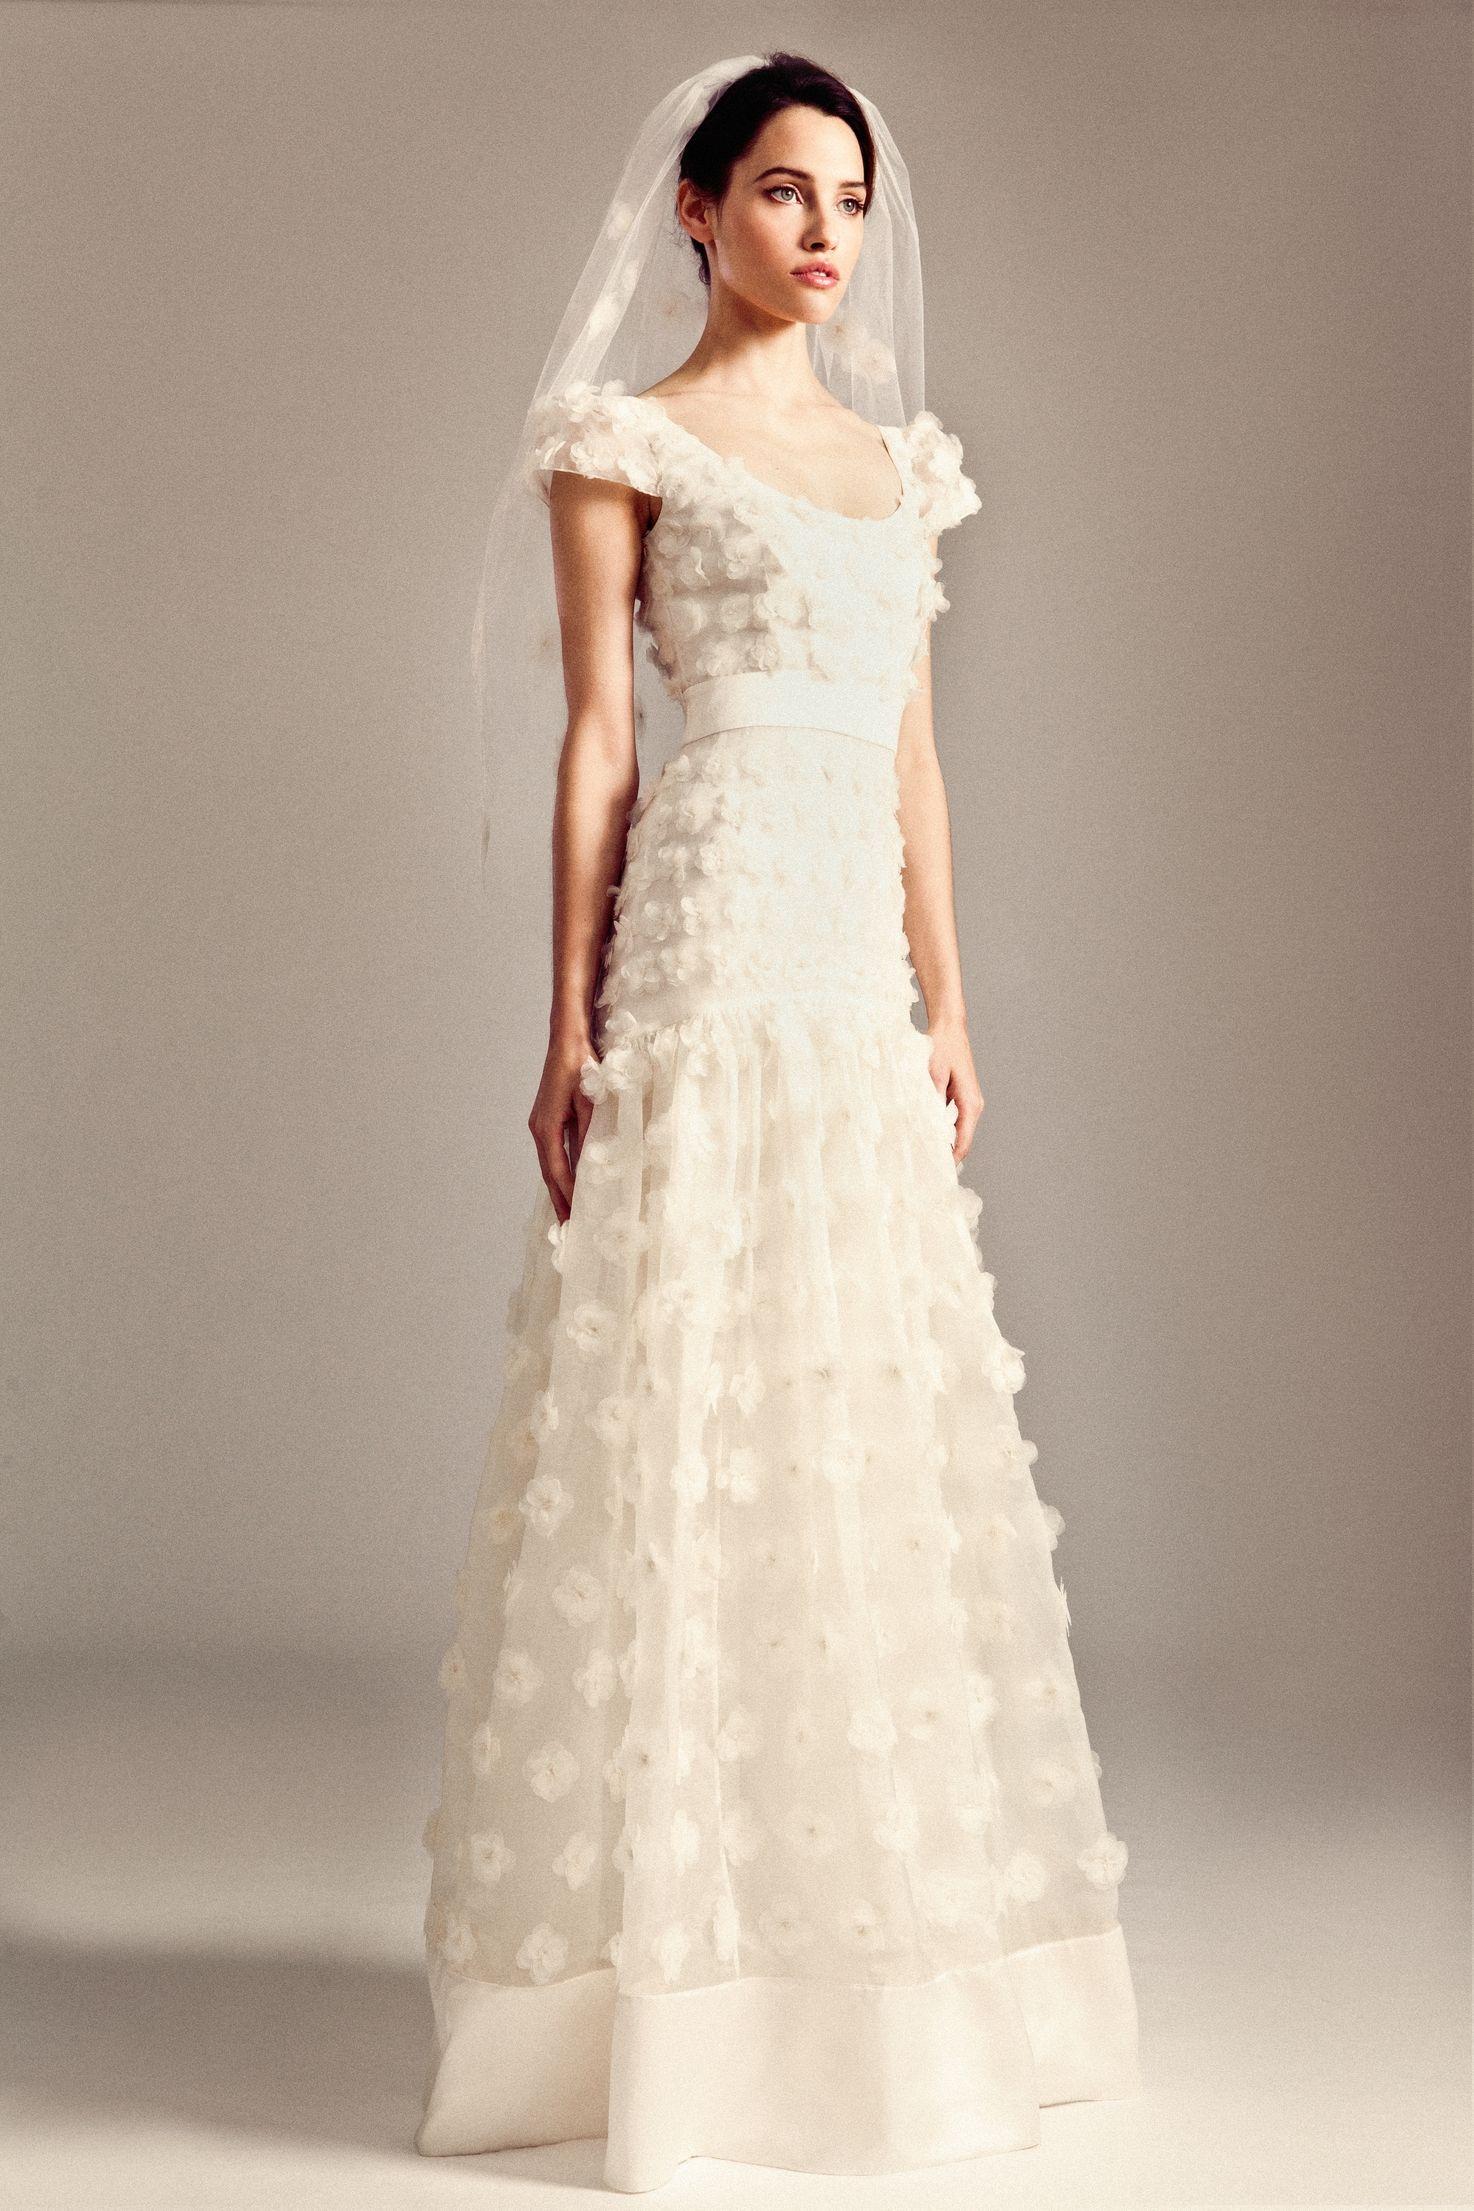 Europe dresses 2018 - Kelly clarkson wedding dress temperley bridal